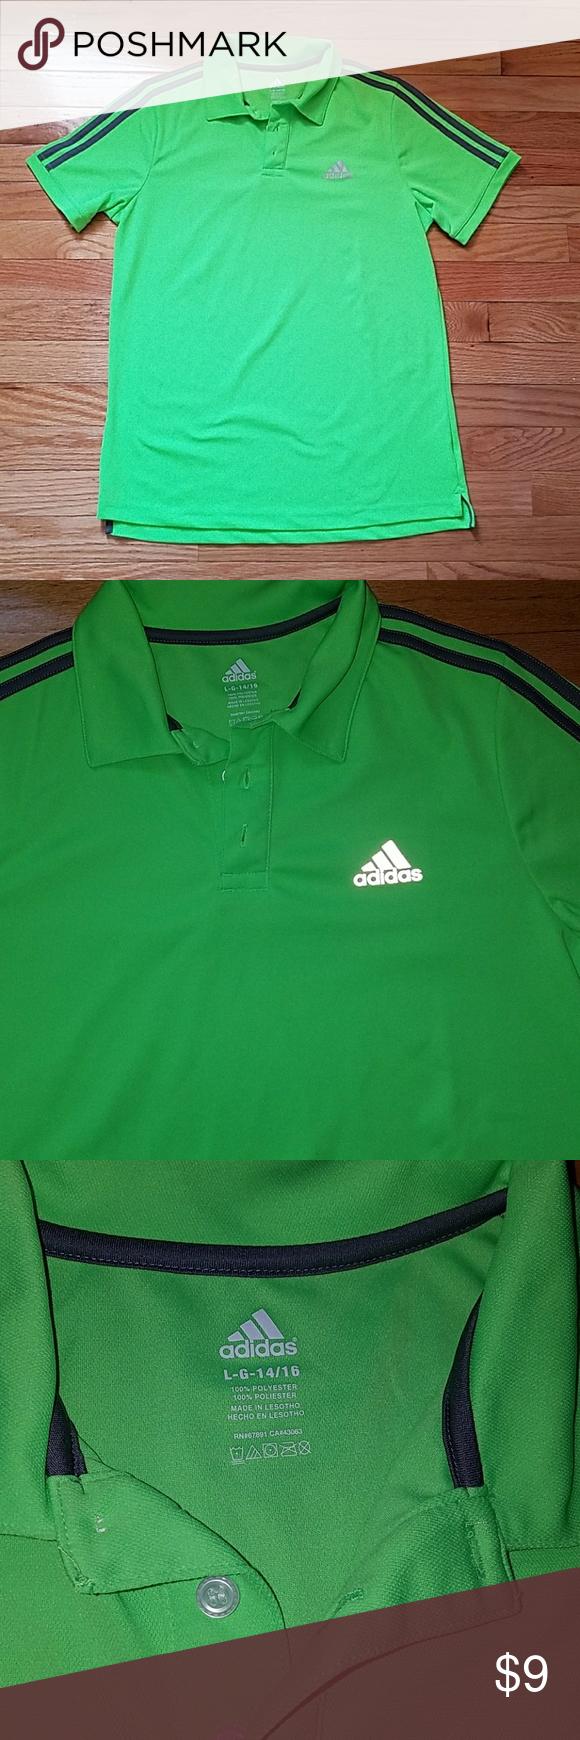 aaba4cc7 Adidas boys golf shirt NEON GREEN Adidas boys golf shirt. Awesome  condition. Super clean